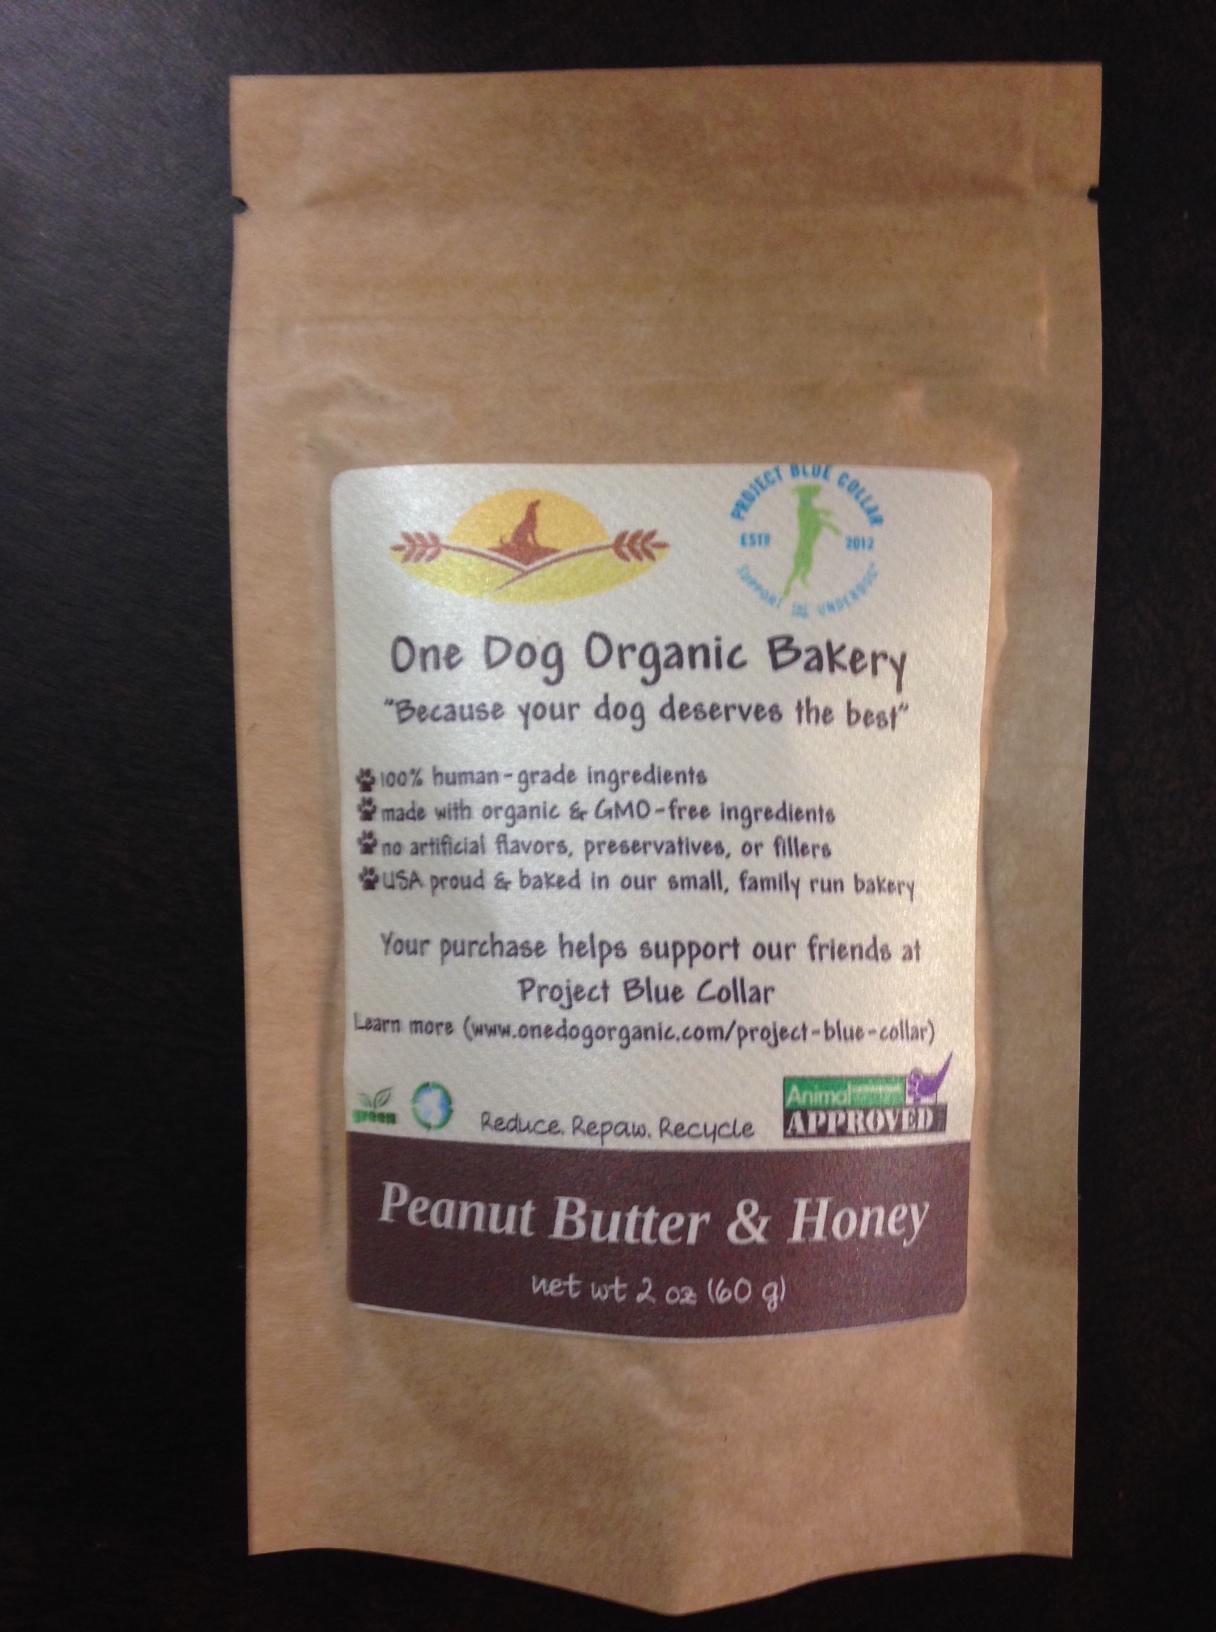 Ritzy One Dog Organic Bakery Organic Dog Gmo Free Gluten Give A Dog A Bone Organic Dog Treats Canada Organic Dog Treats Near Me bark post Organic Dog Treats